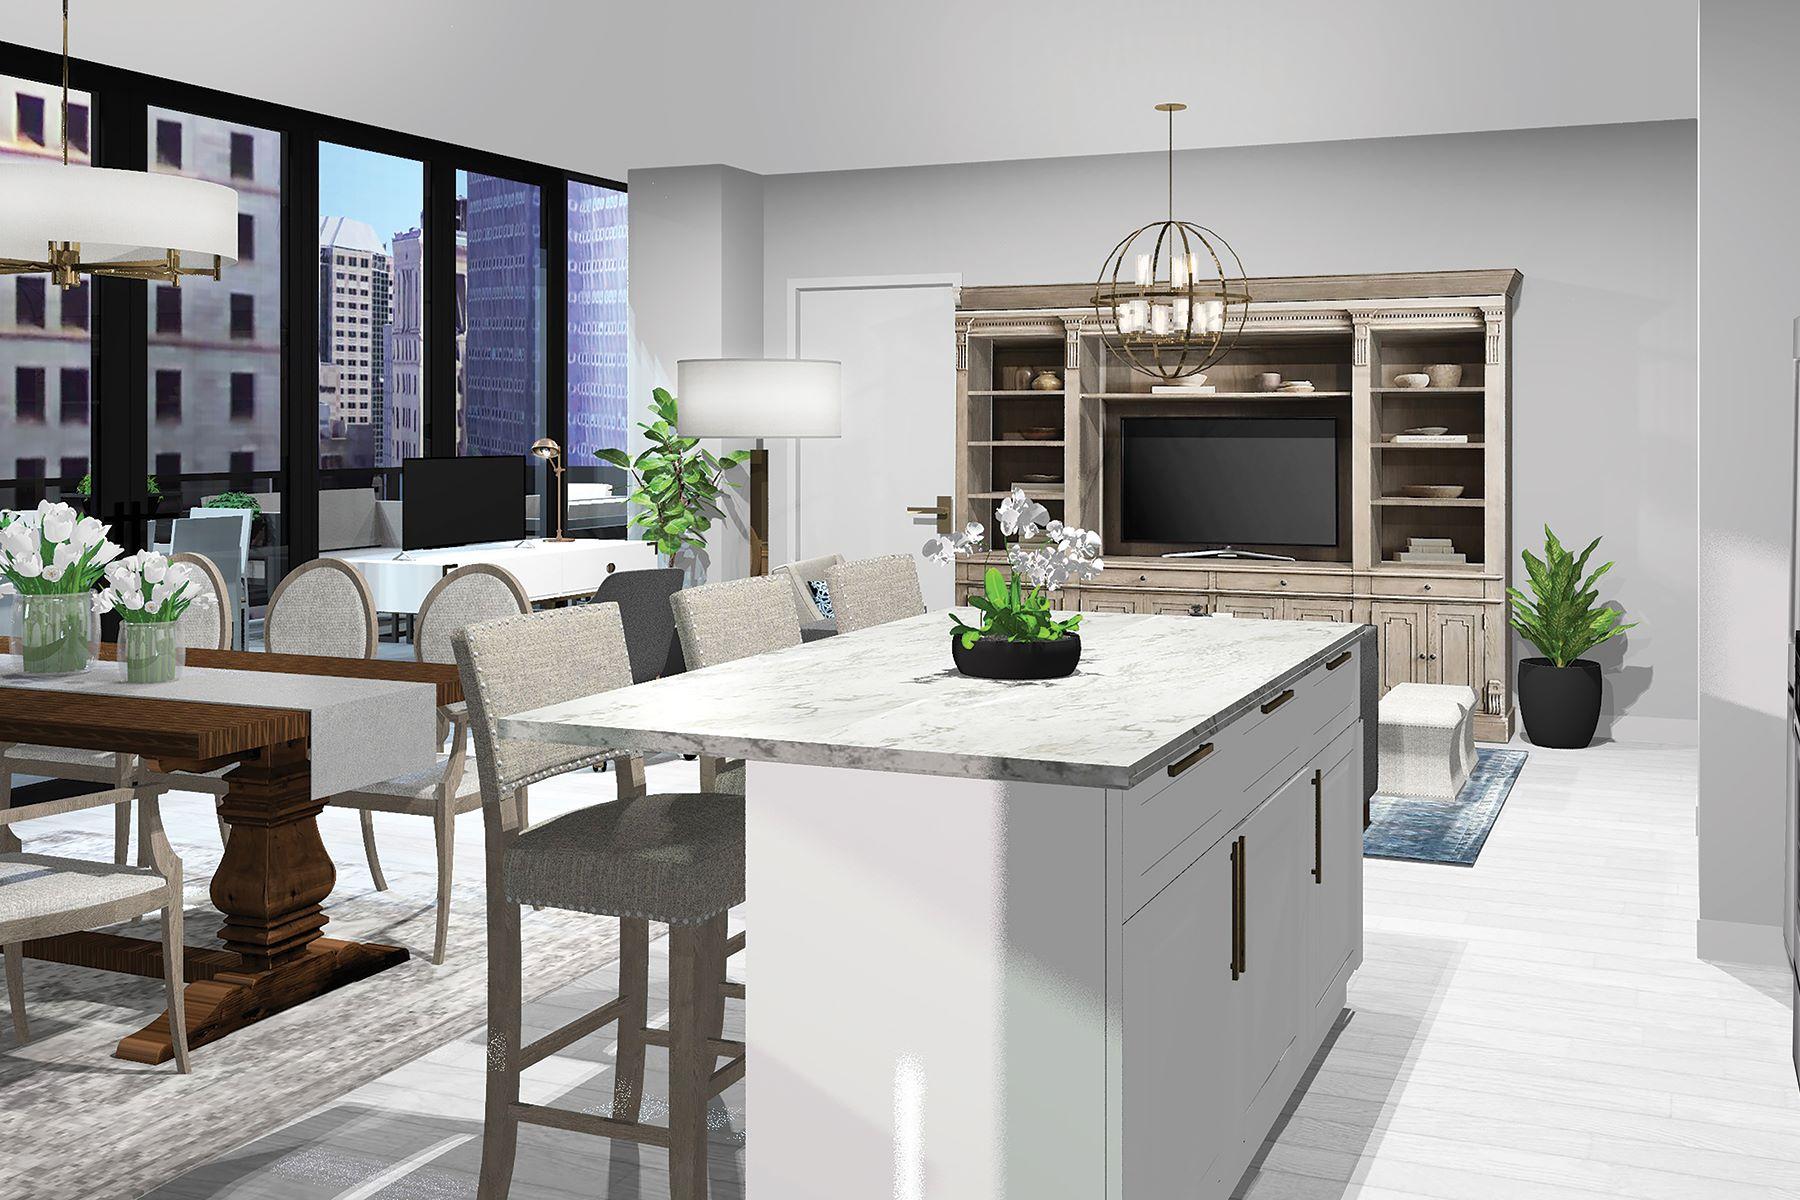 共管式独立产权公寓 为 销售 在 The Aurora Residence at Lumiére 350 Oliver Avenue #1002, Downtown Pittsburgh, Pittsburgh, 宾夕法尼亚州, 15222 美国